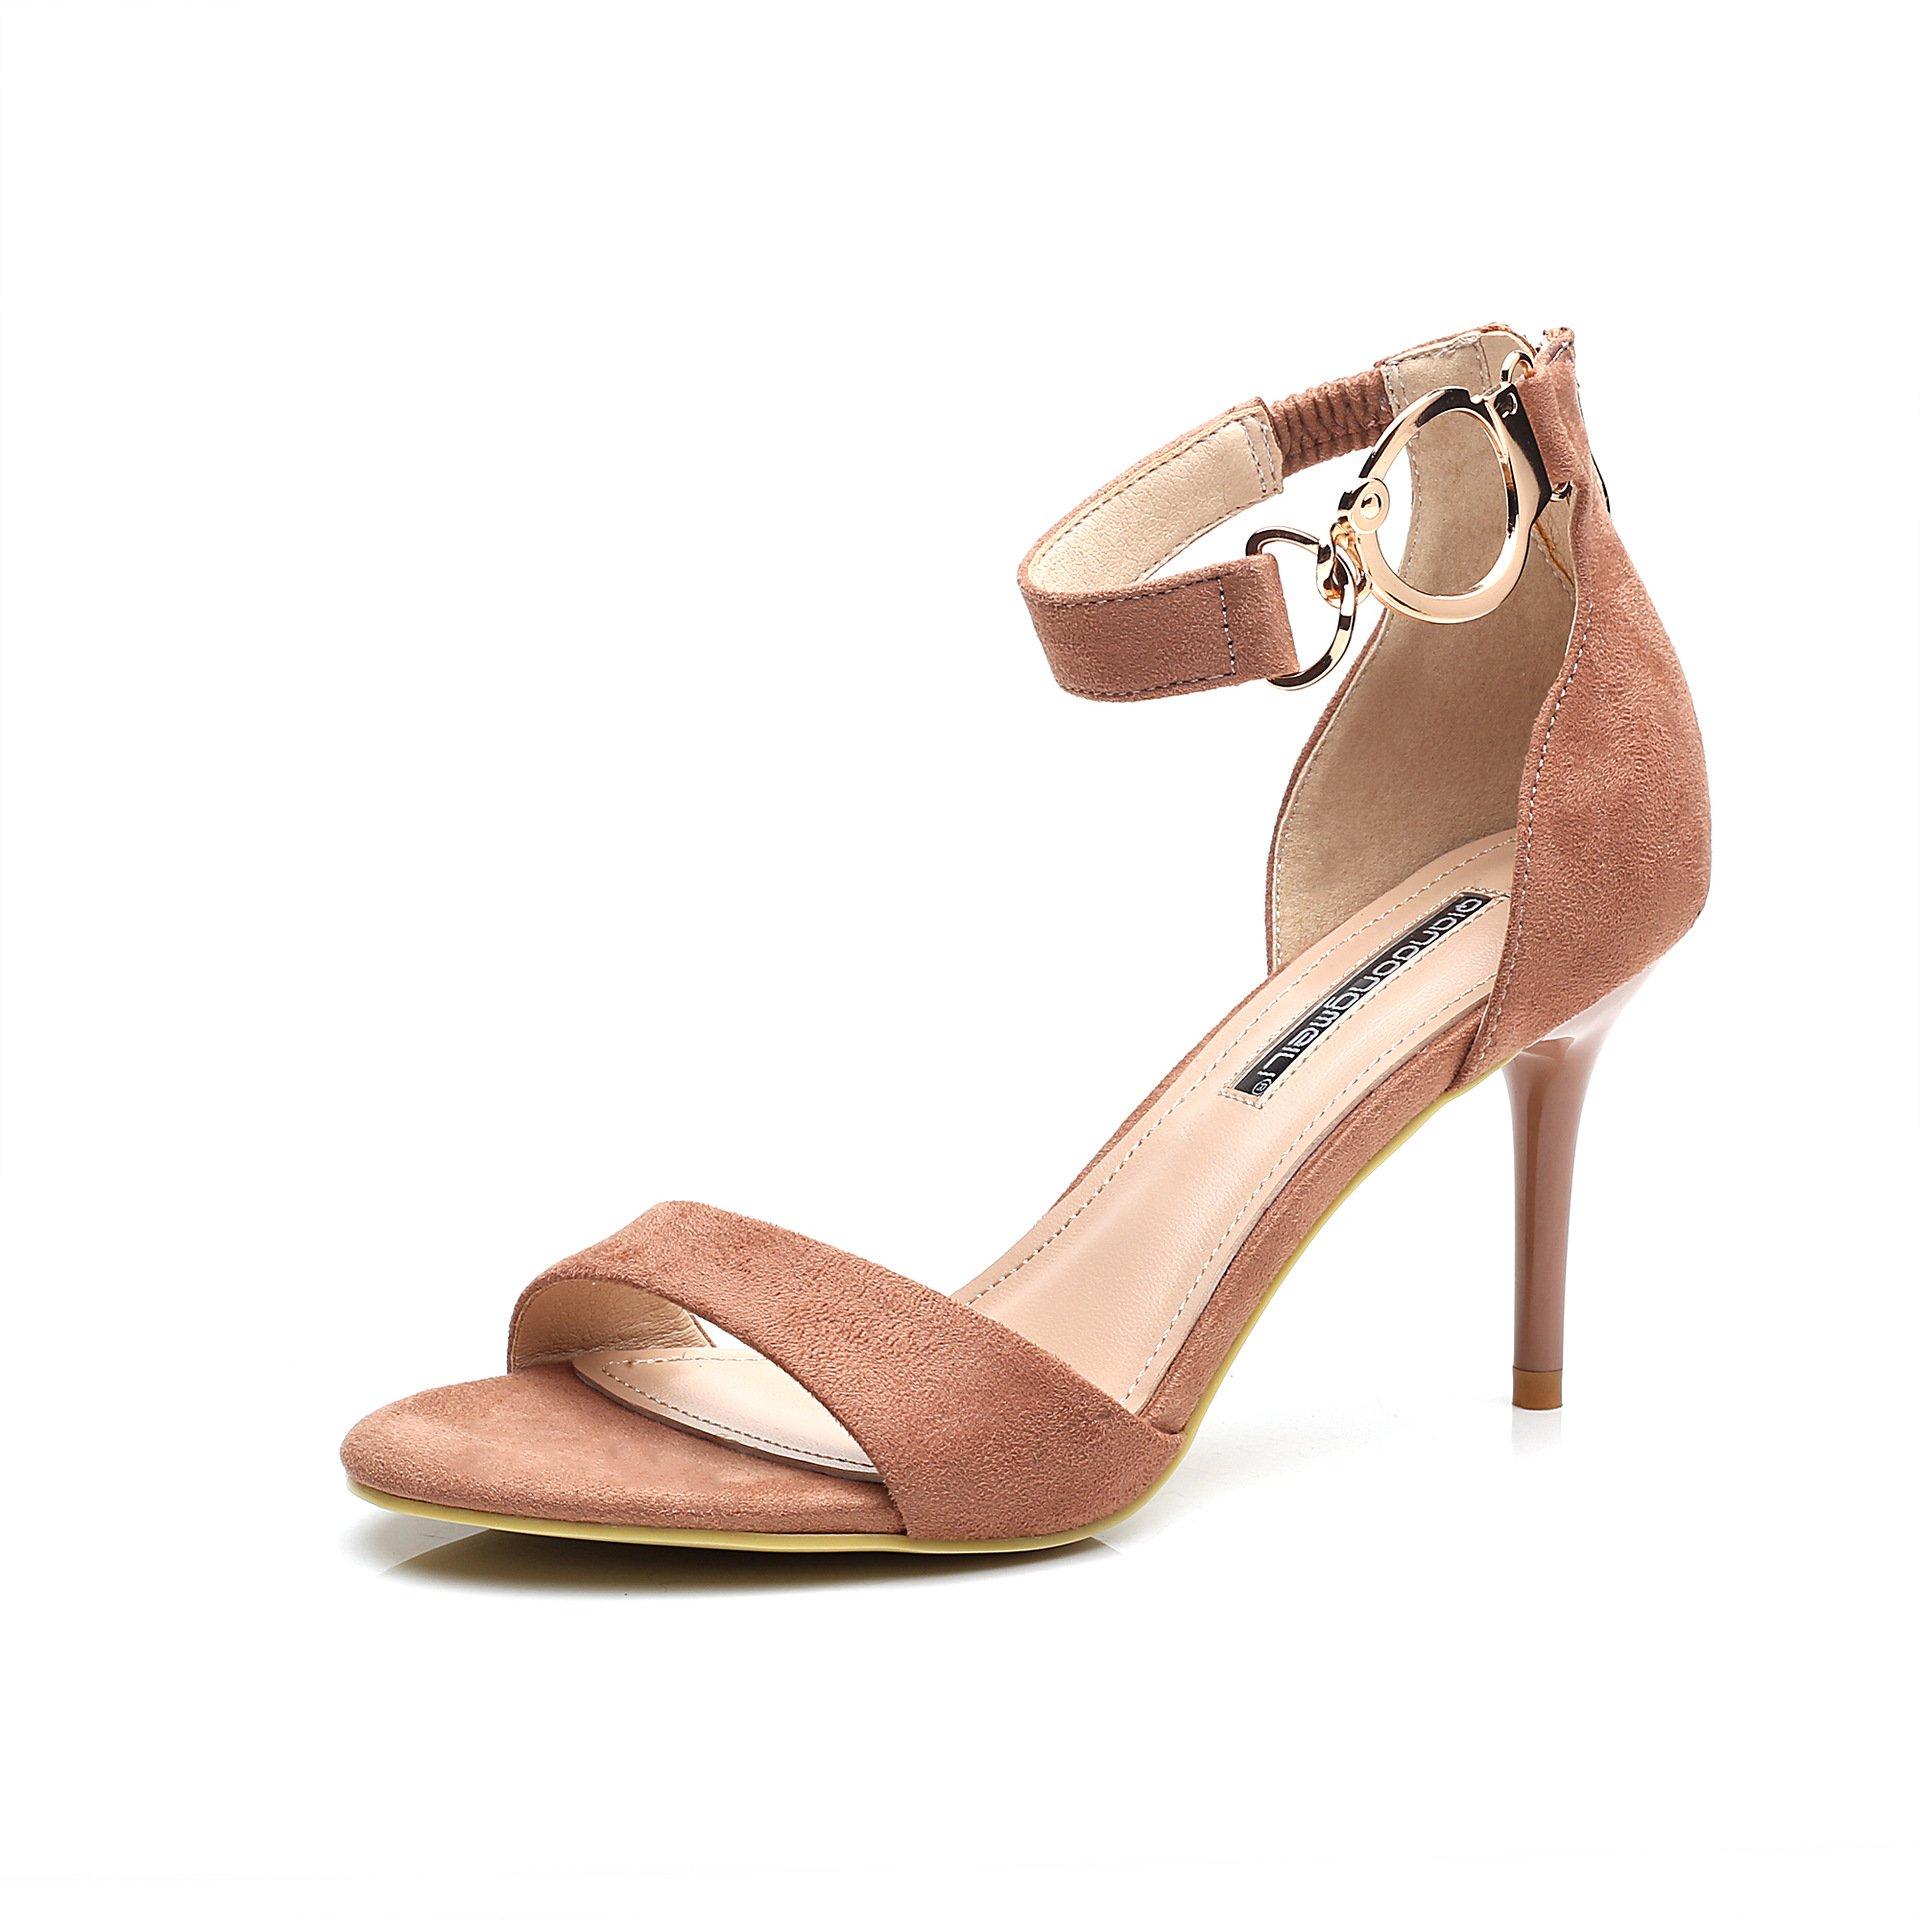 Korean women's shoes, black shoes fine with high heels buckle heels, pink, 35